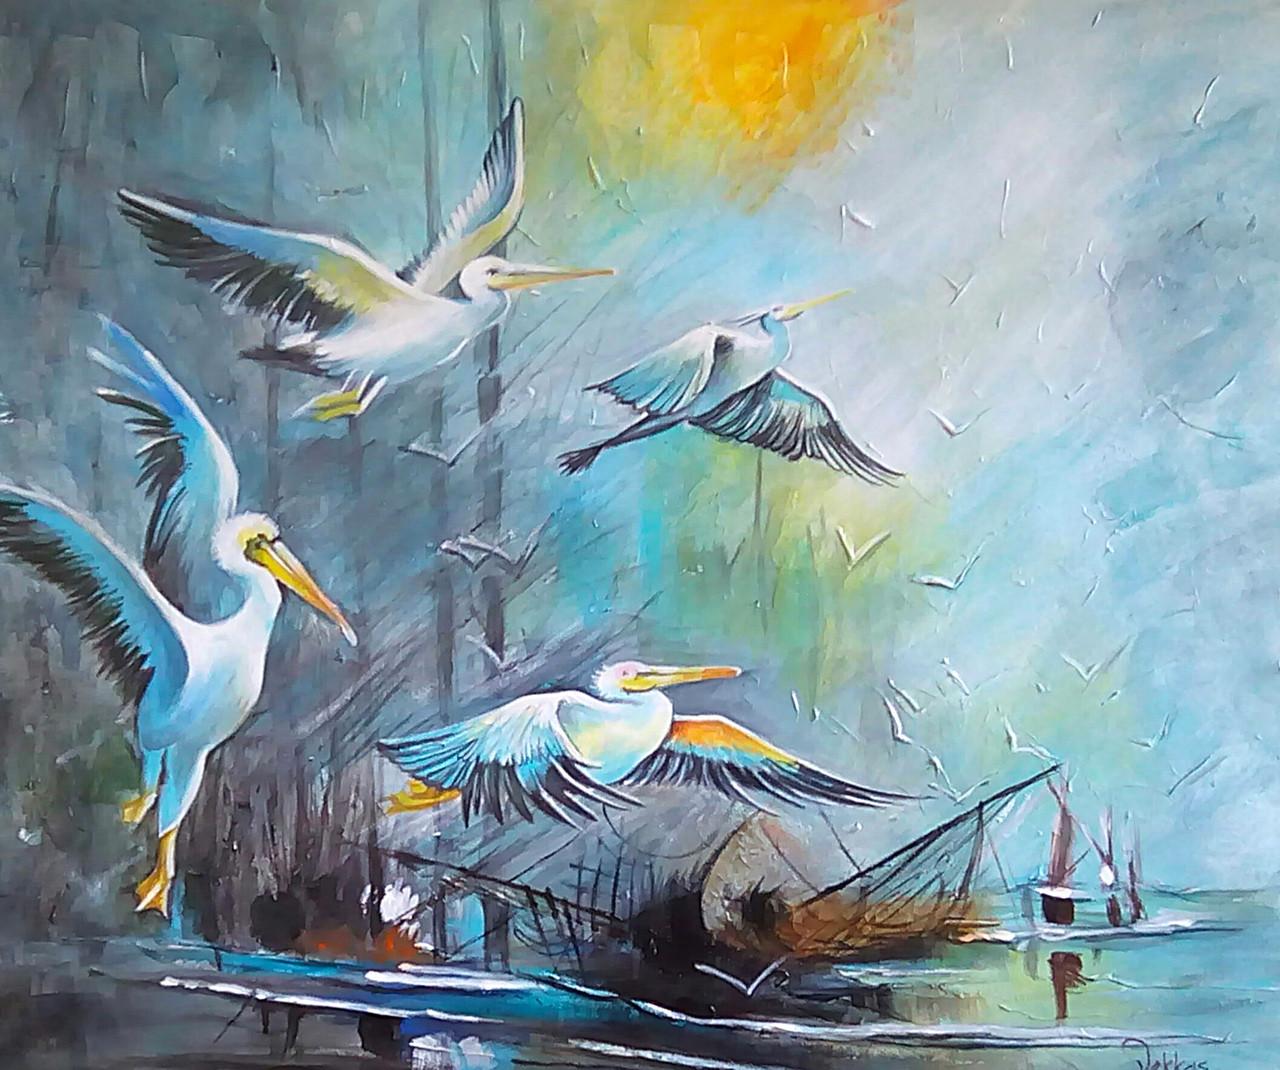 Buying Paintings Online